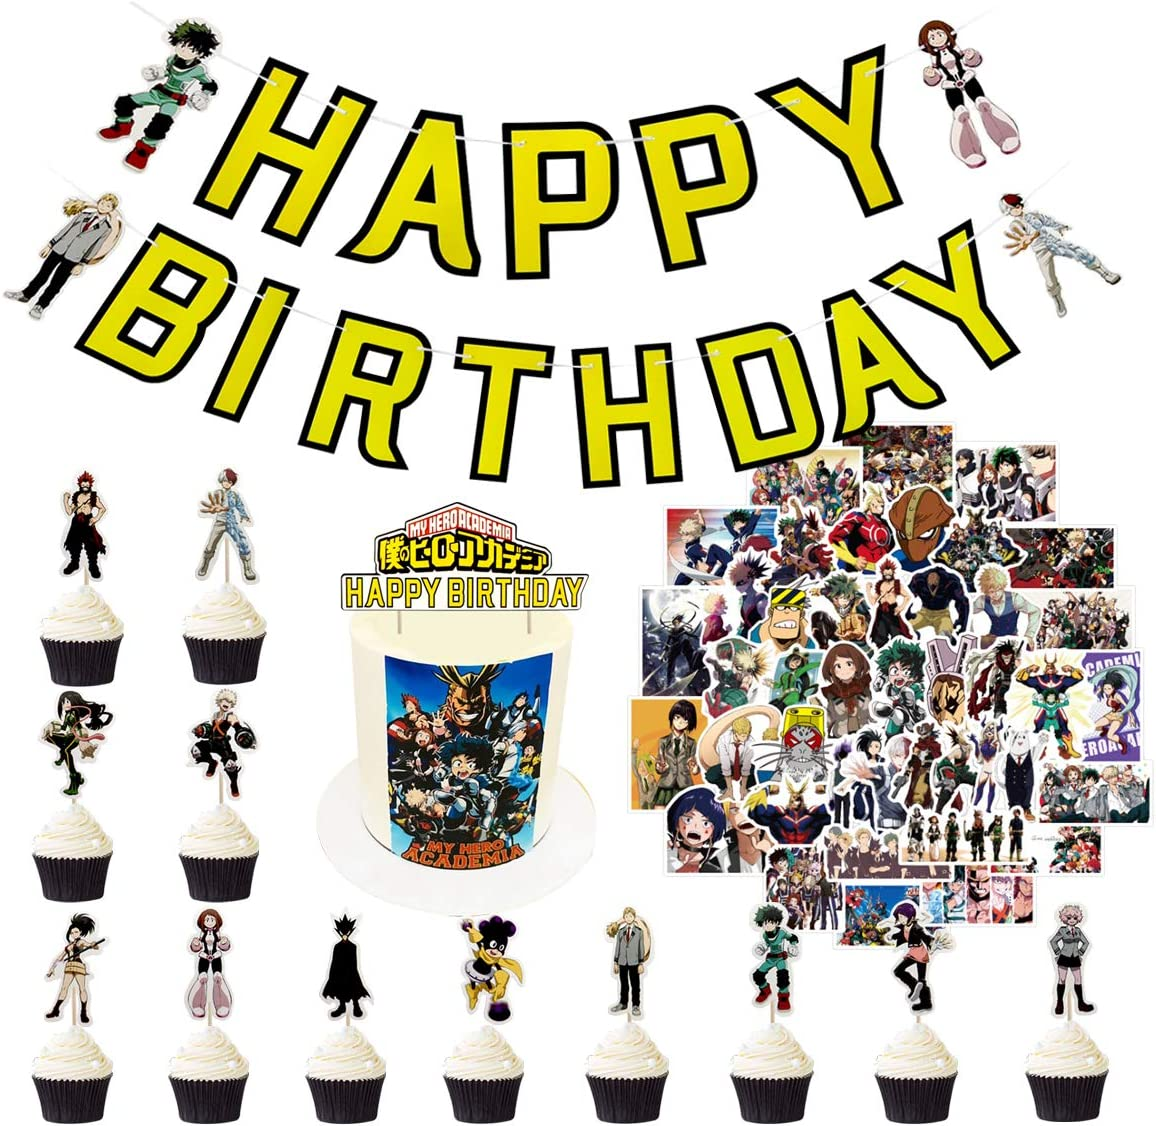 My Hero Academia Birthday Party Supplies,MHA Gift Set Include Happy Birthday Banner - Cake Toppers - 24 Cupcake Toppers - 50 Stickers,MHA Merch for Party Decoration